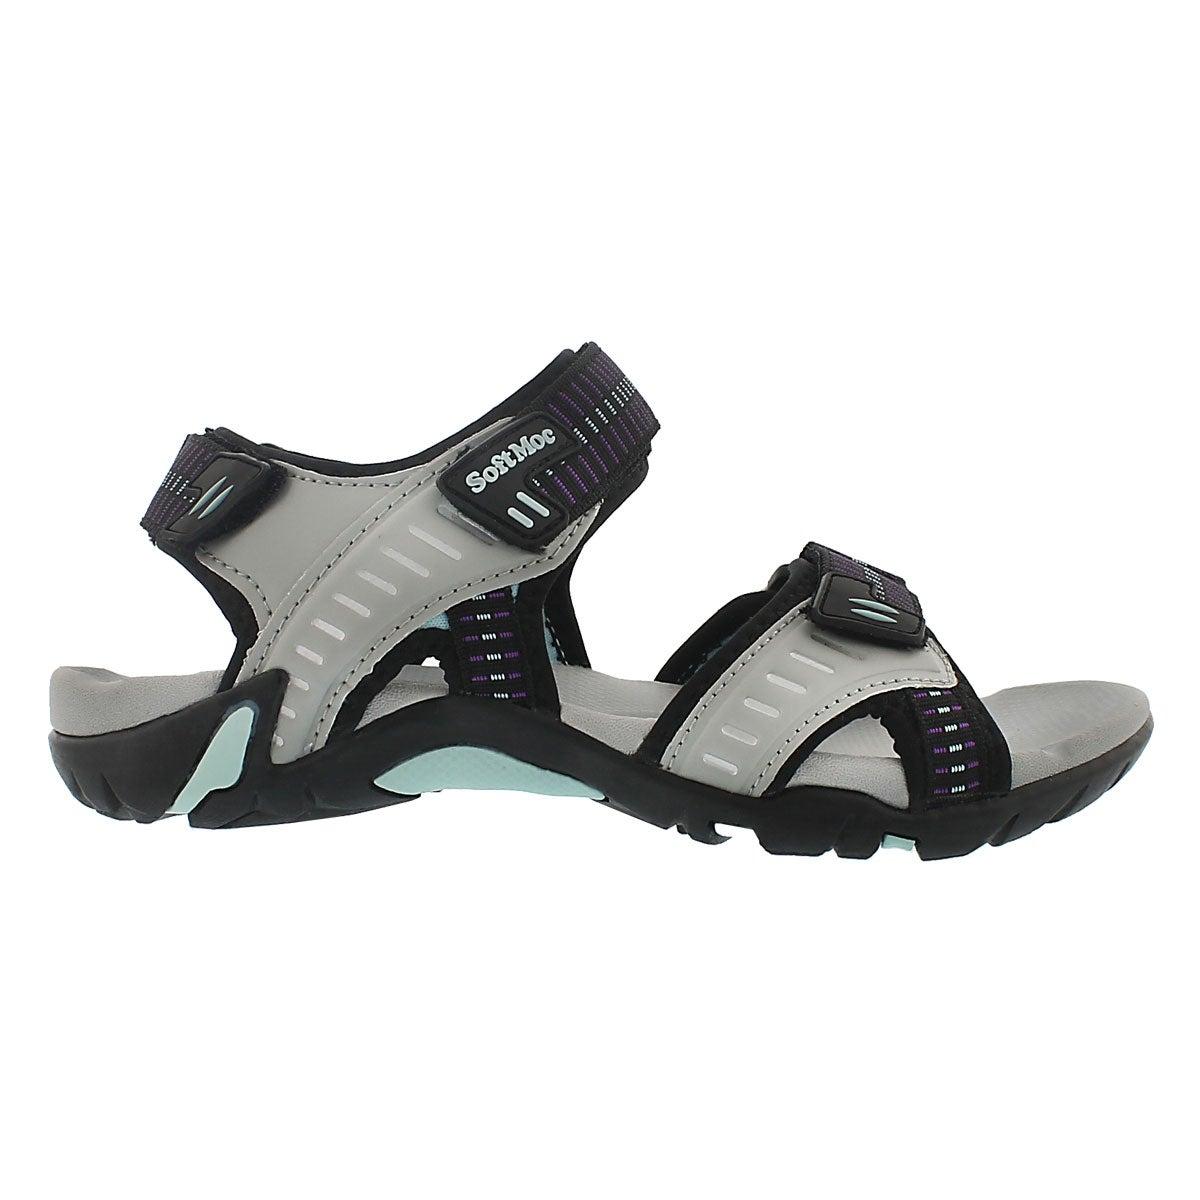 Sandale sport Kara, gris, femmes